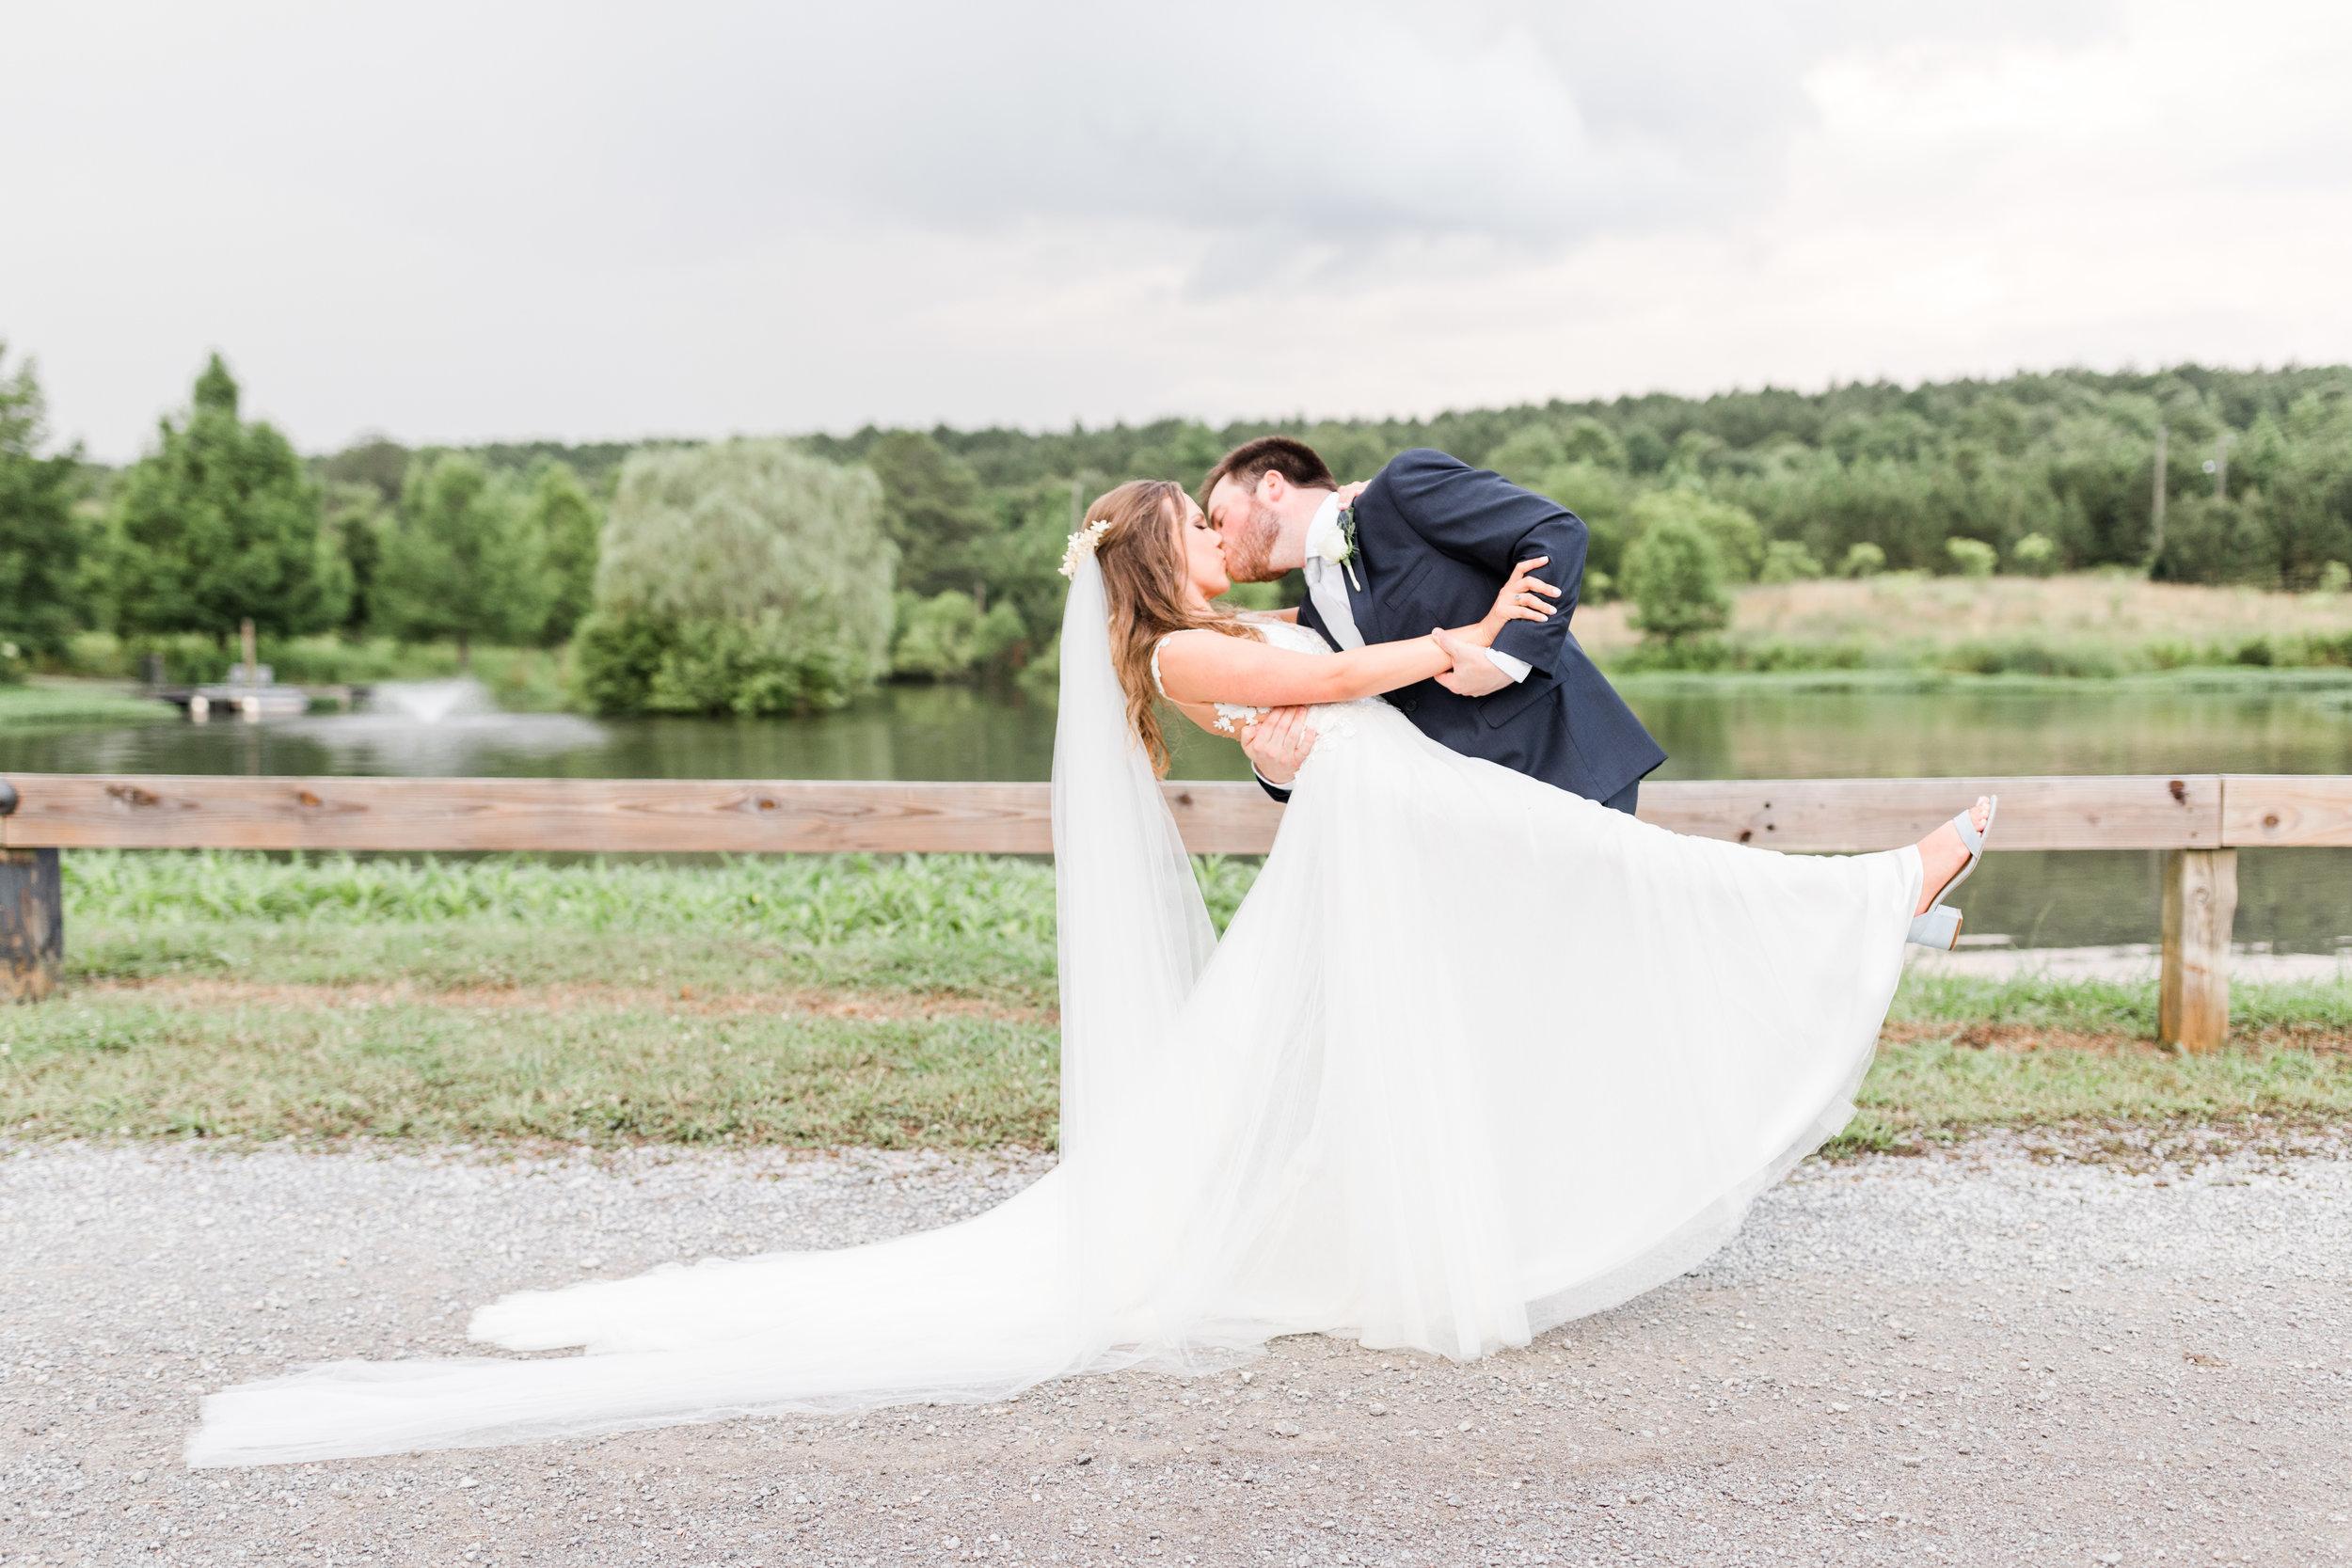 Genna & Barker Wedding Day-5137.jpg